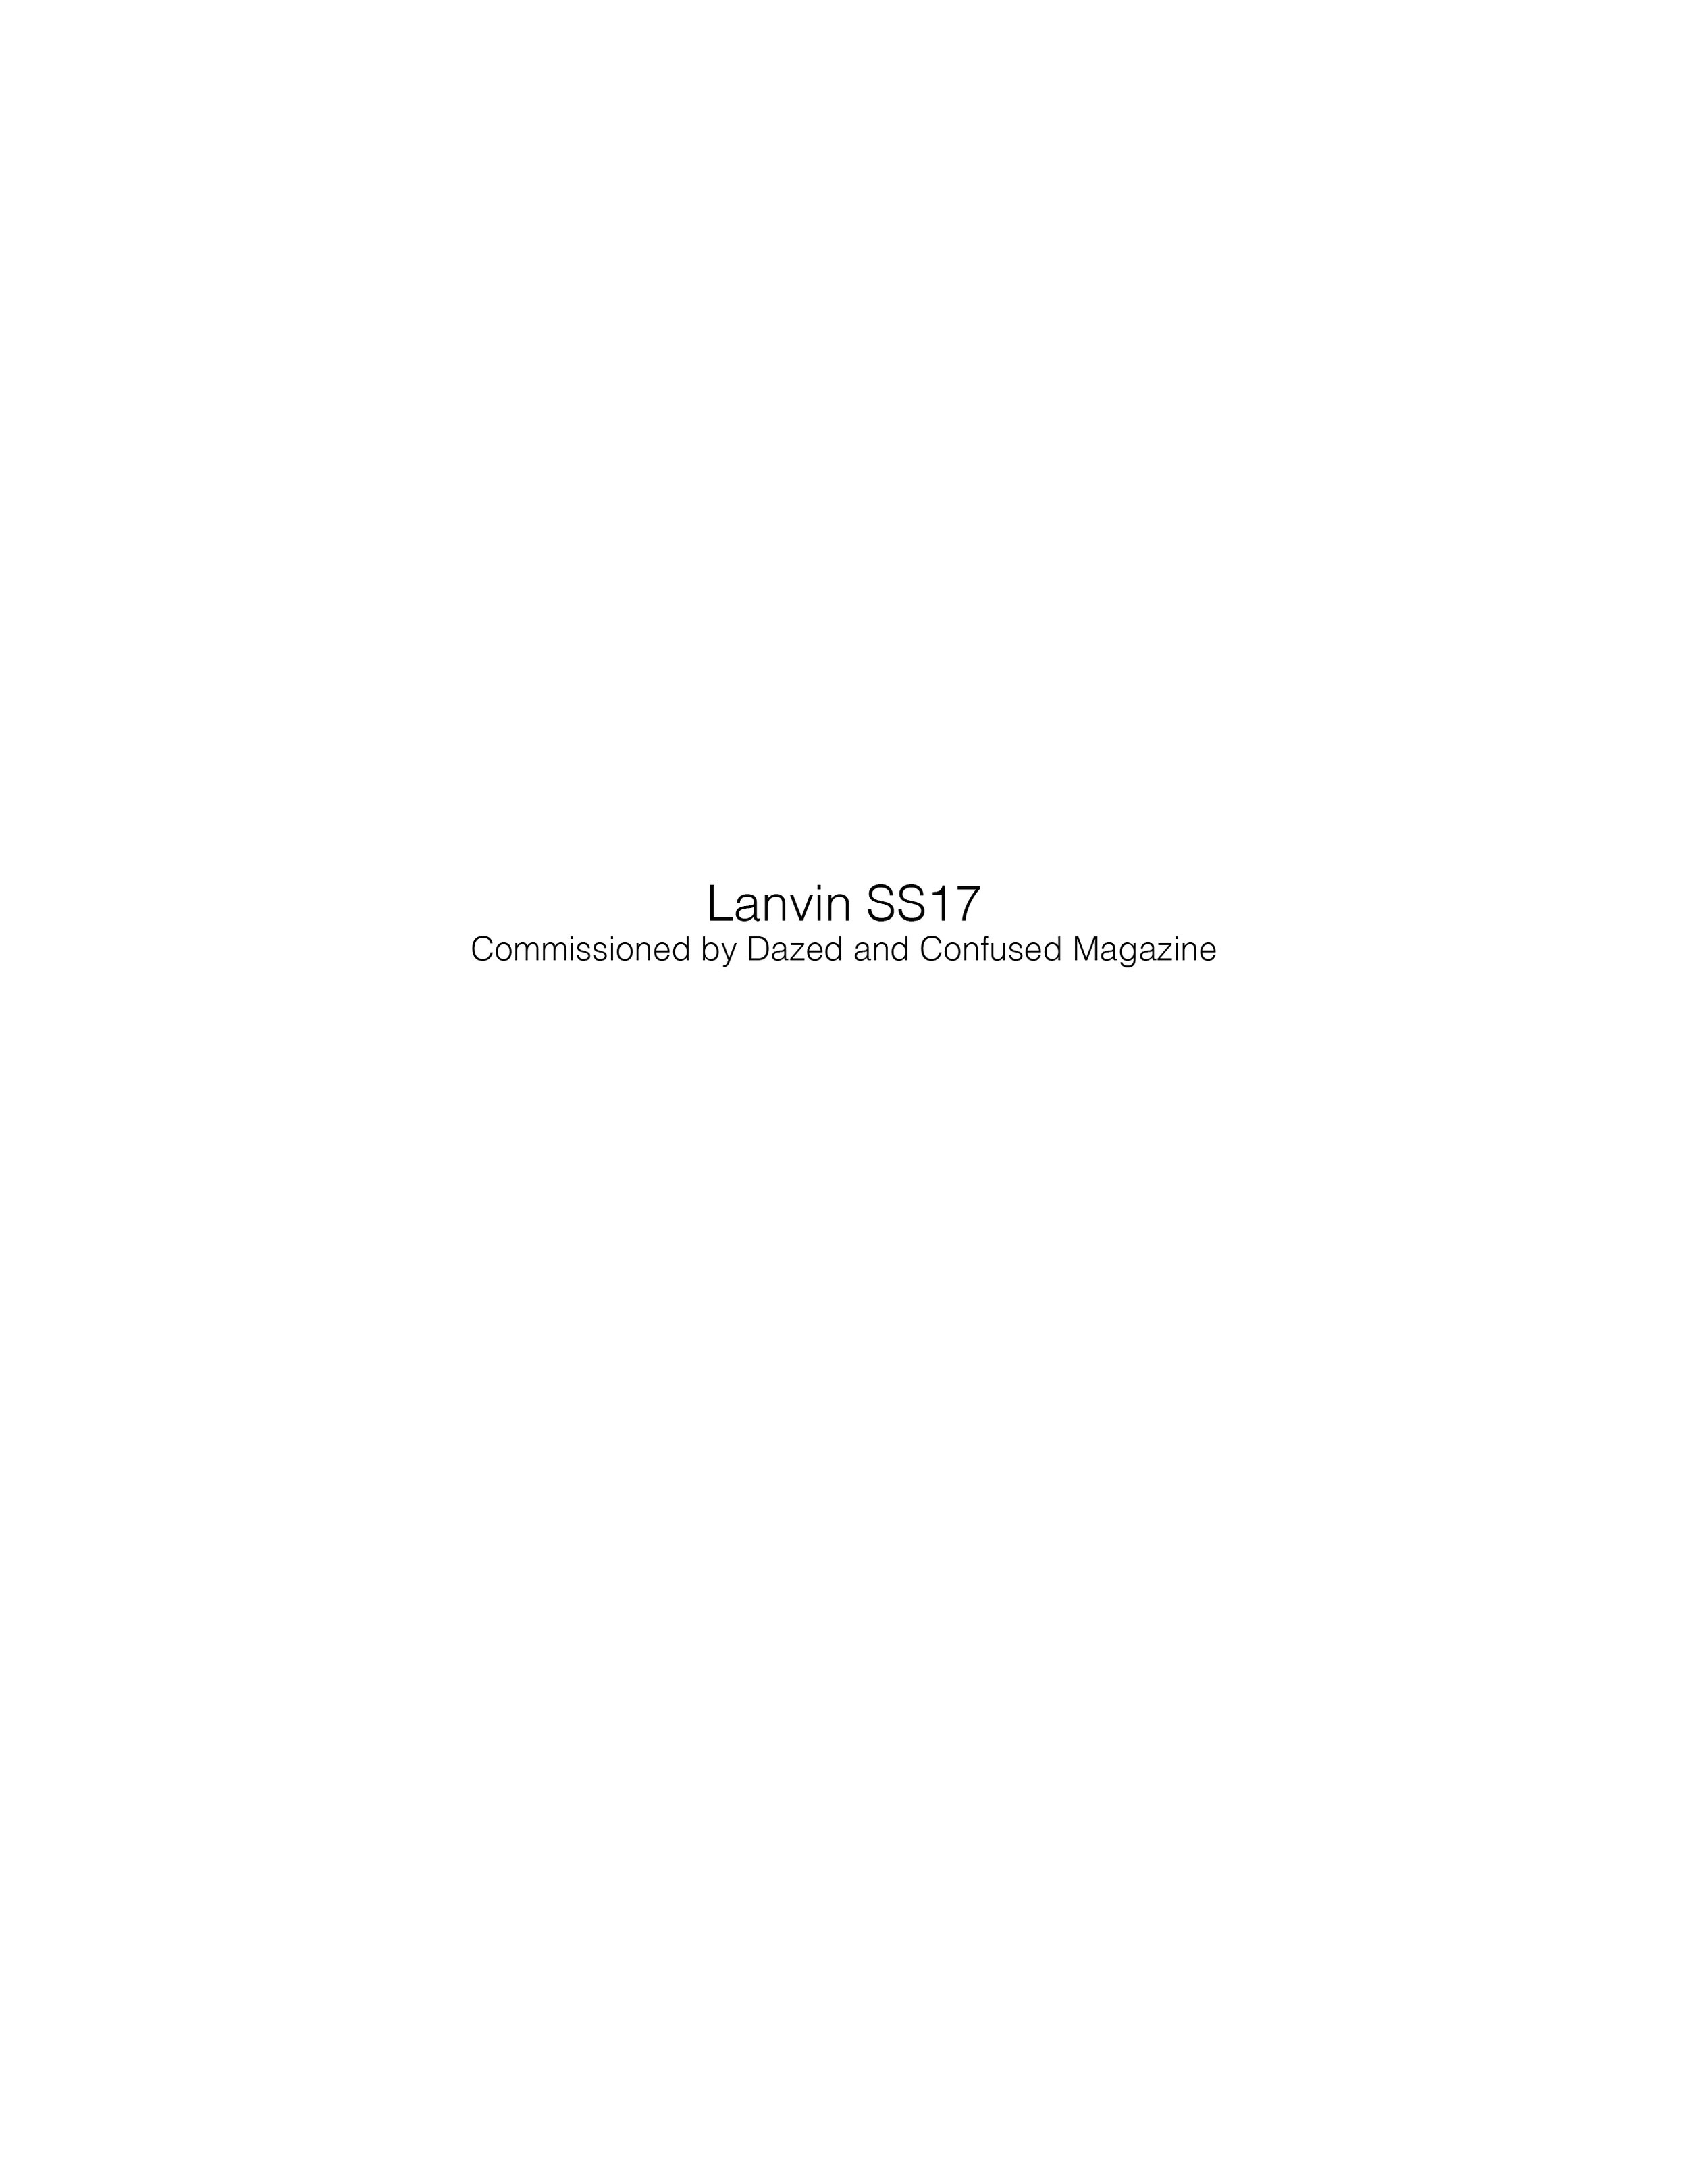 Lanvin SS17 Title Card.jpg